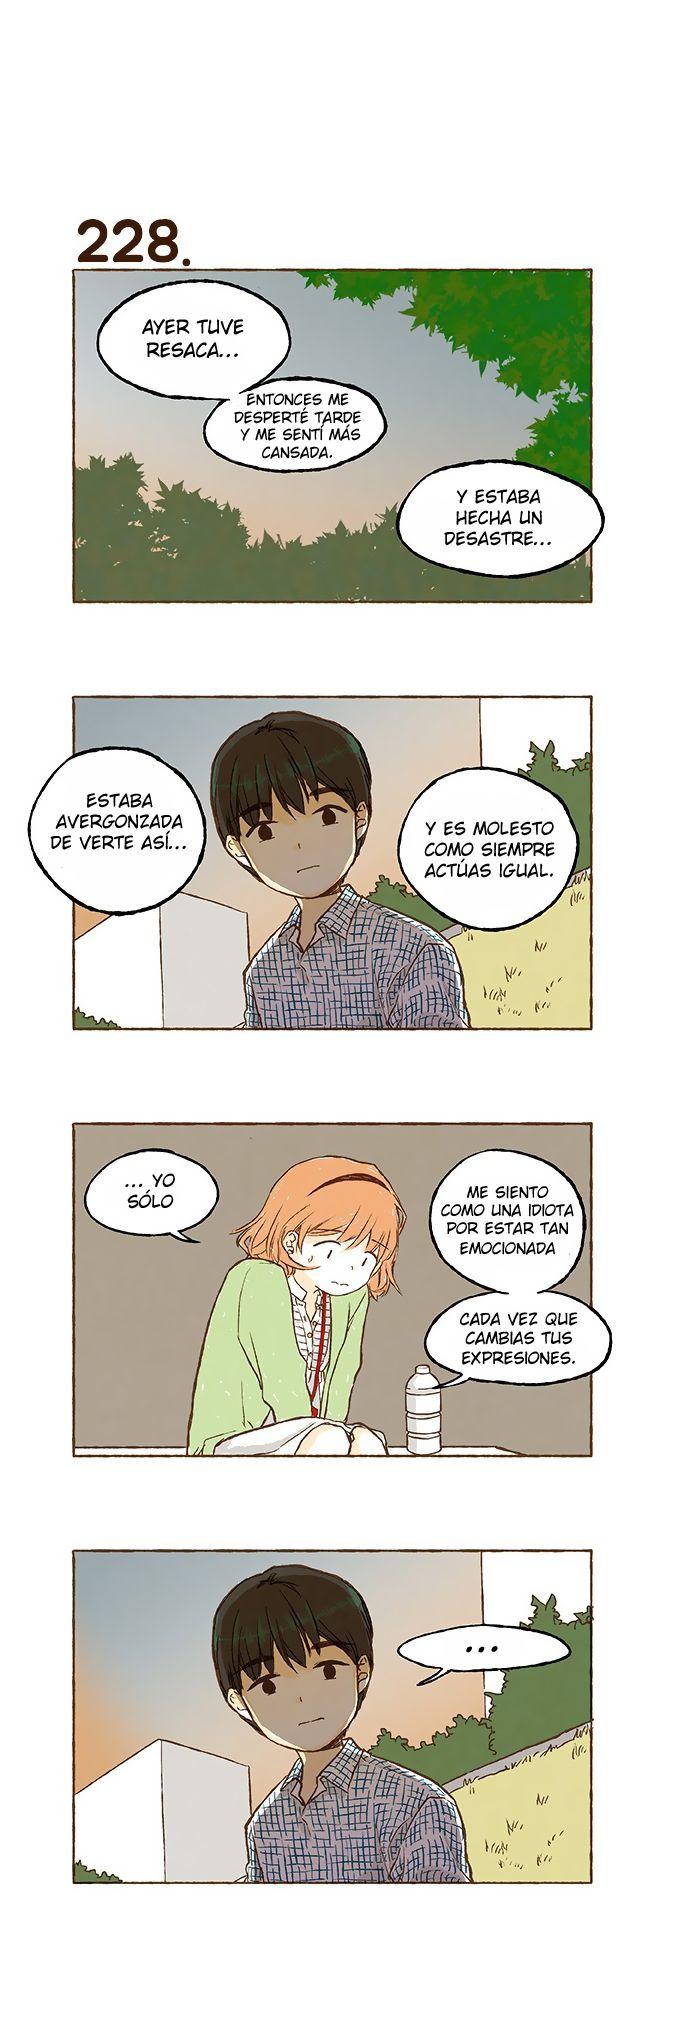 http://c5.ninemanga.com/es_manga/pic2/61/17725/512455/968b953f363587487f416354d7264678.jpg Page 8